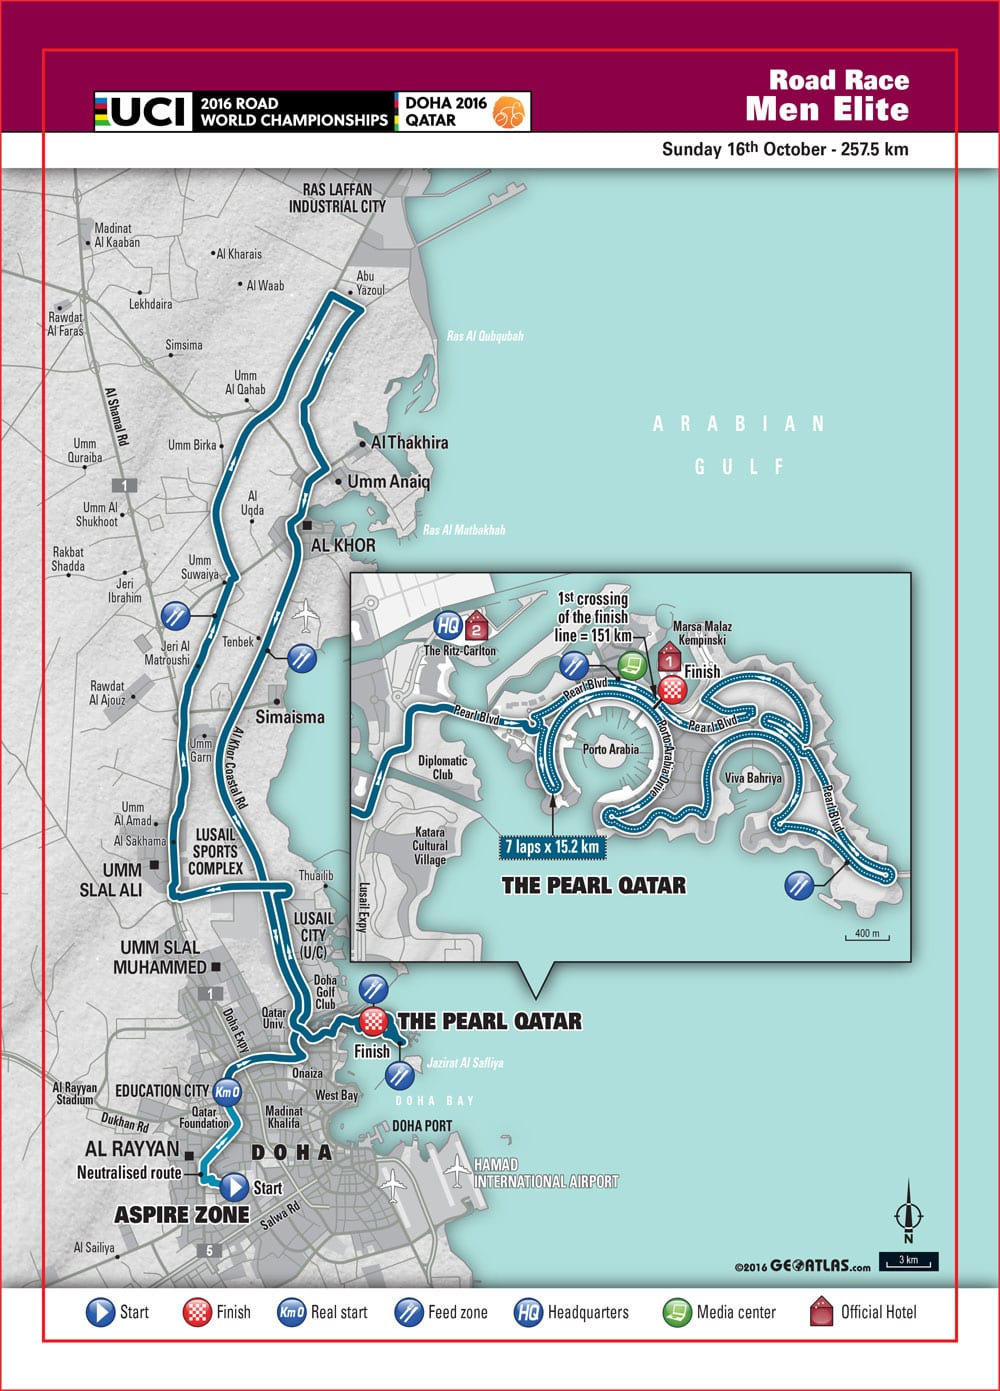 road-race-men-elite-map